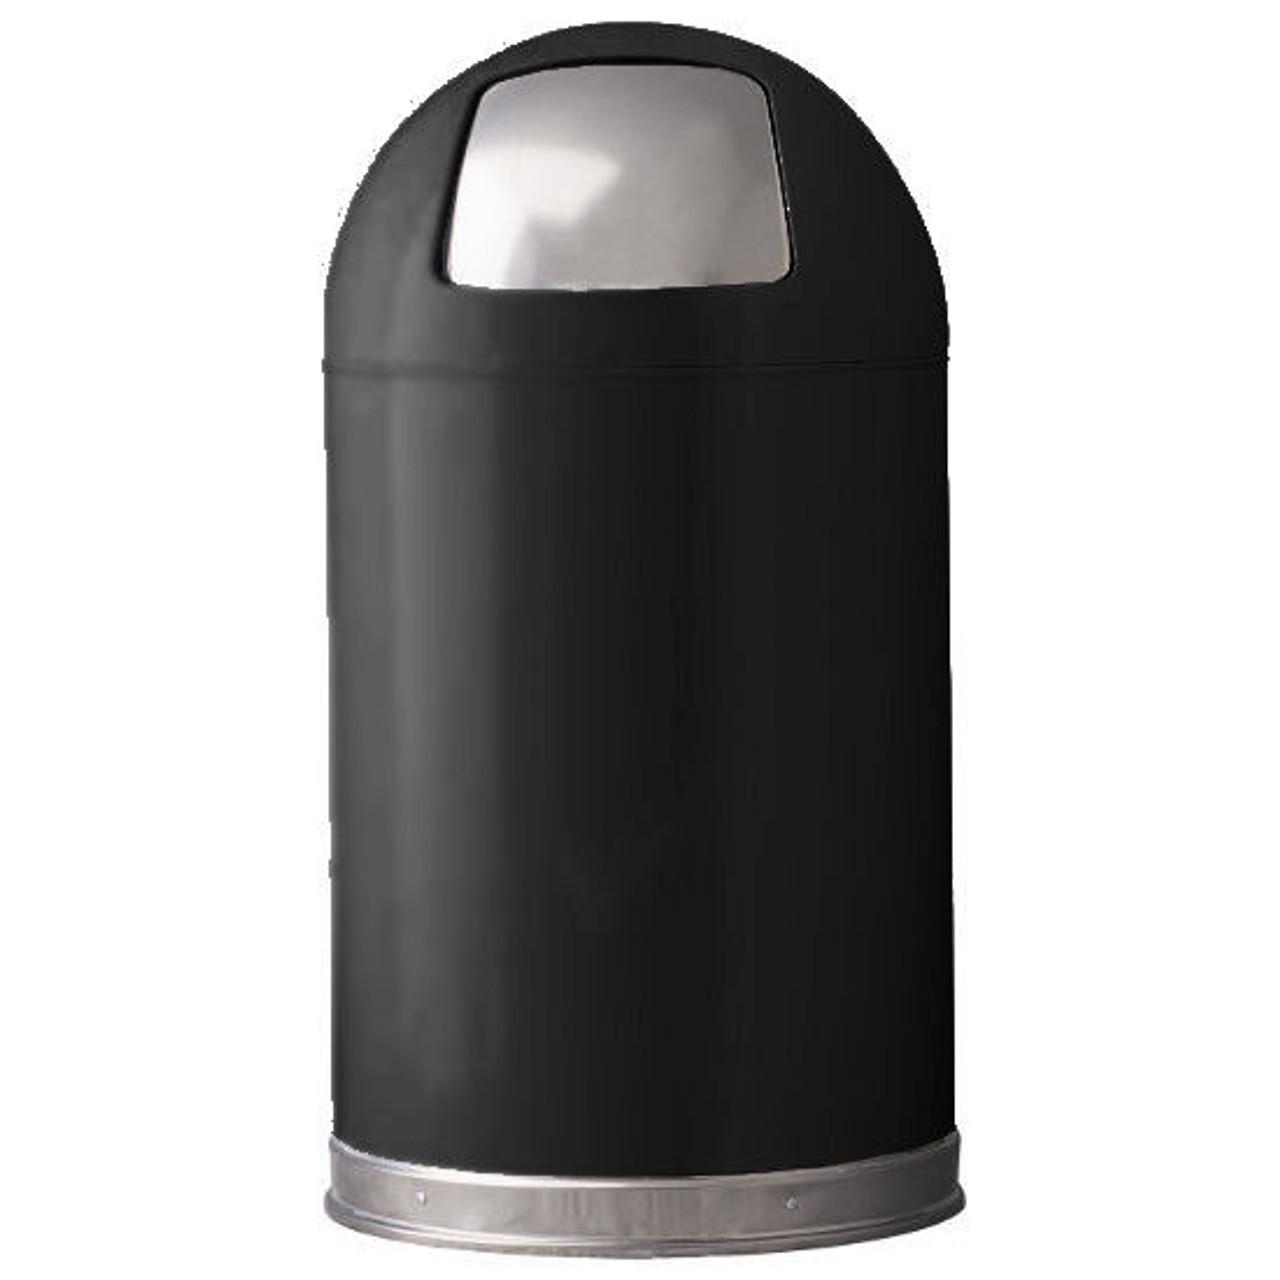 12 Gallon Metal Black Push Door Dome Top Trash Can 12DT